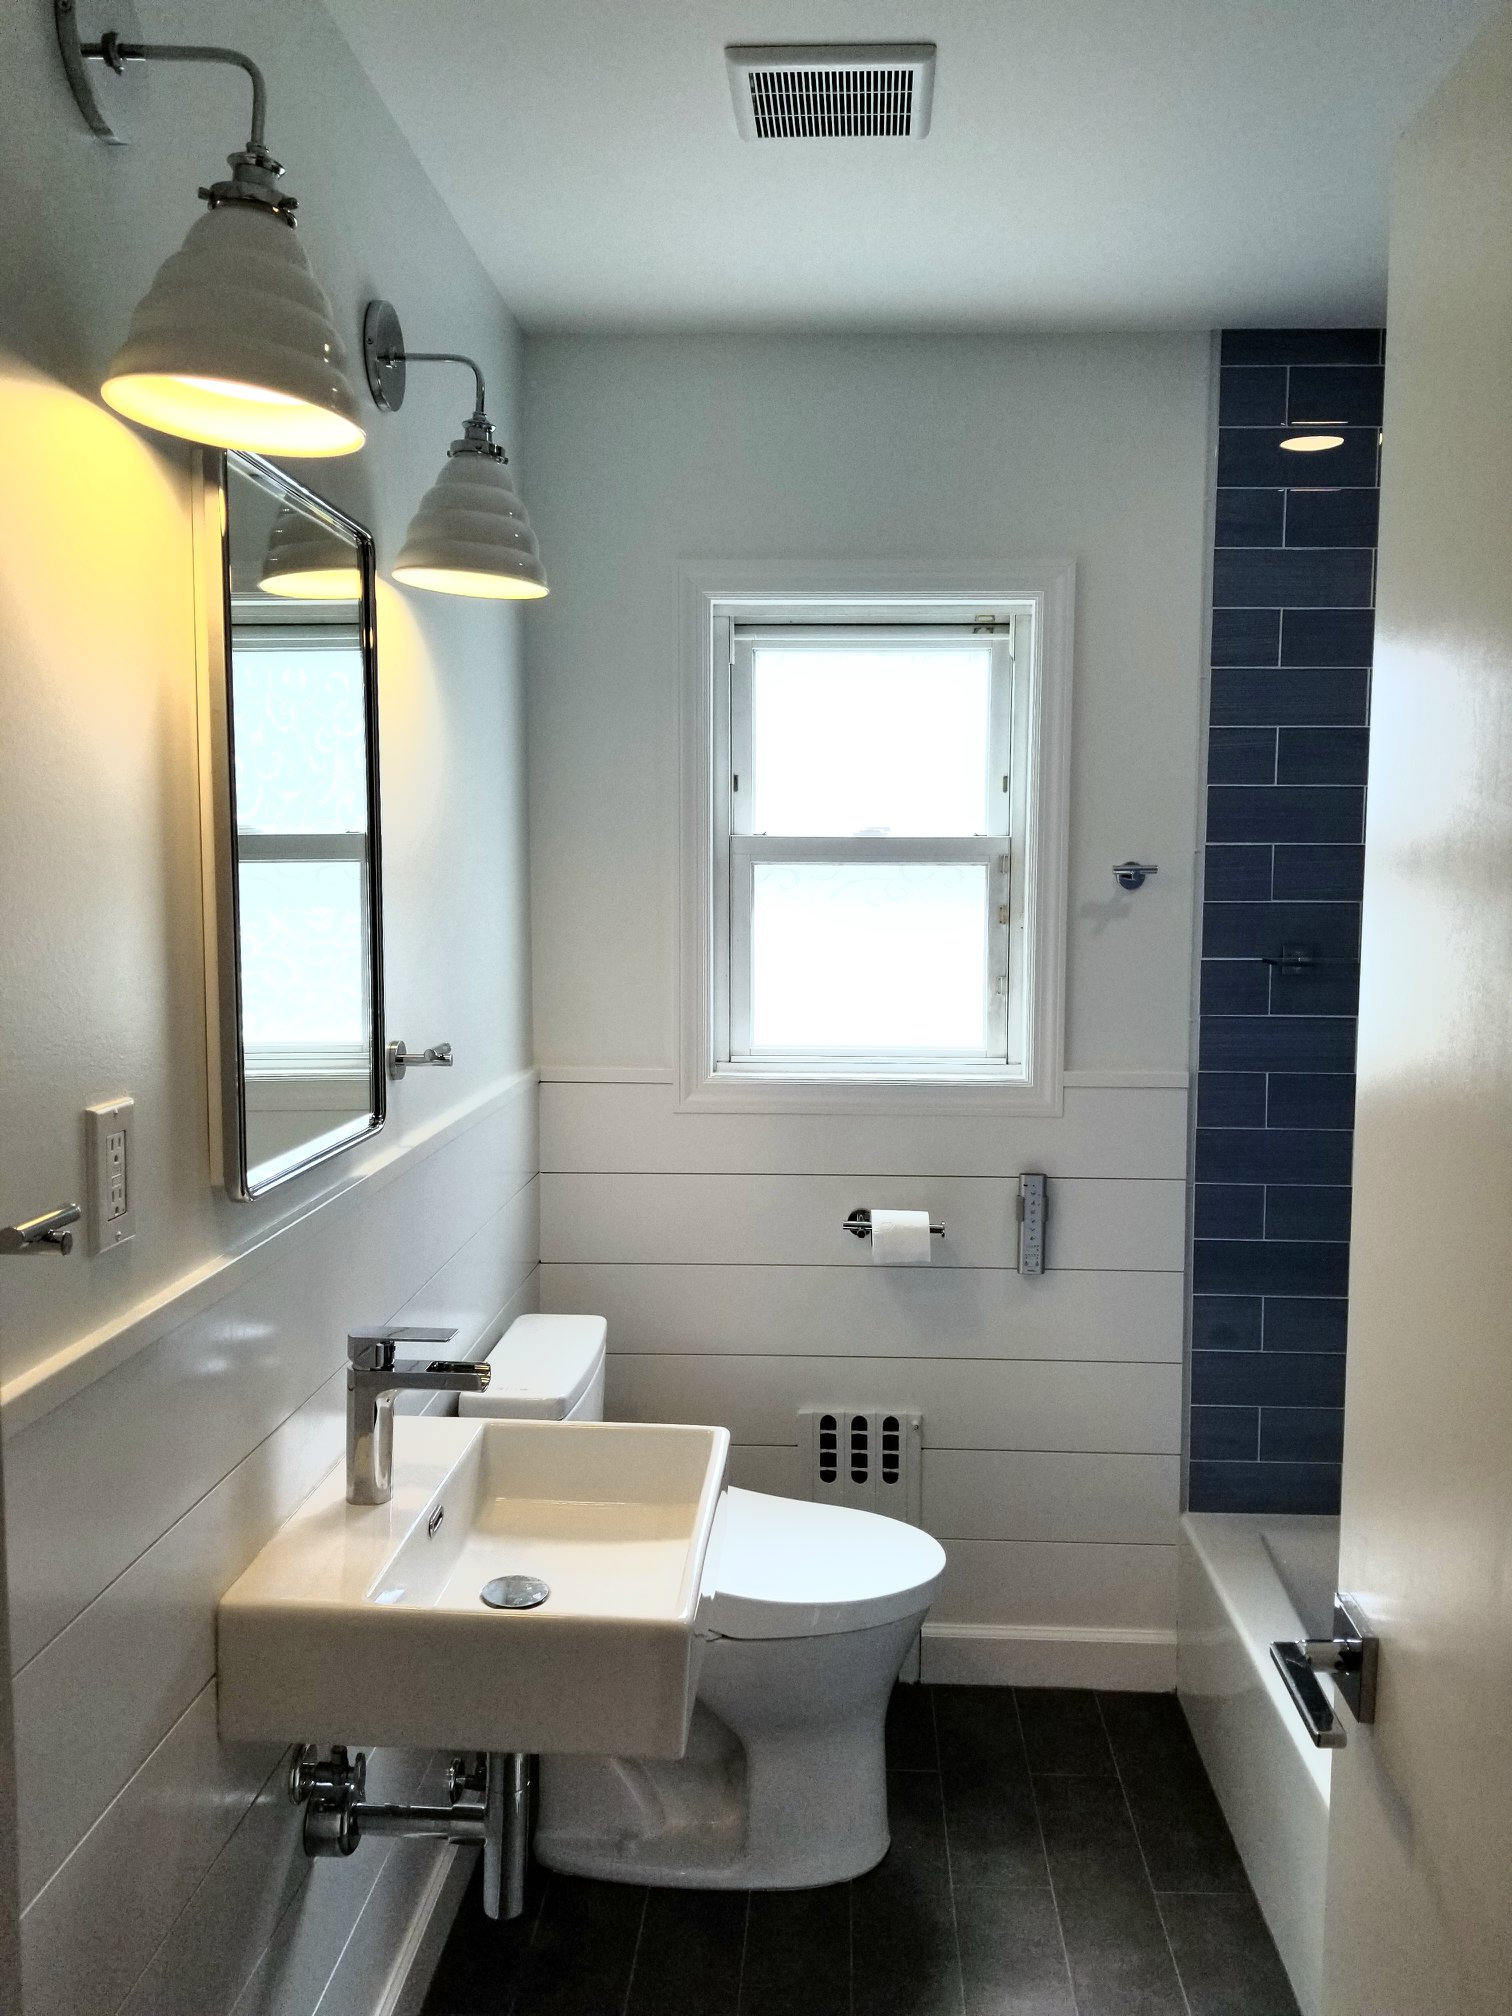 Long Island Bathroom Remodeling Fair, Bathroom Contractors Long Island